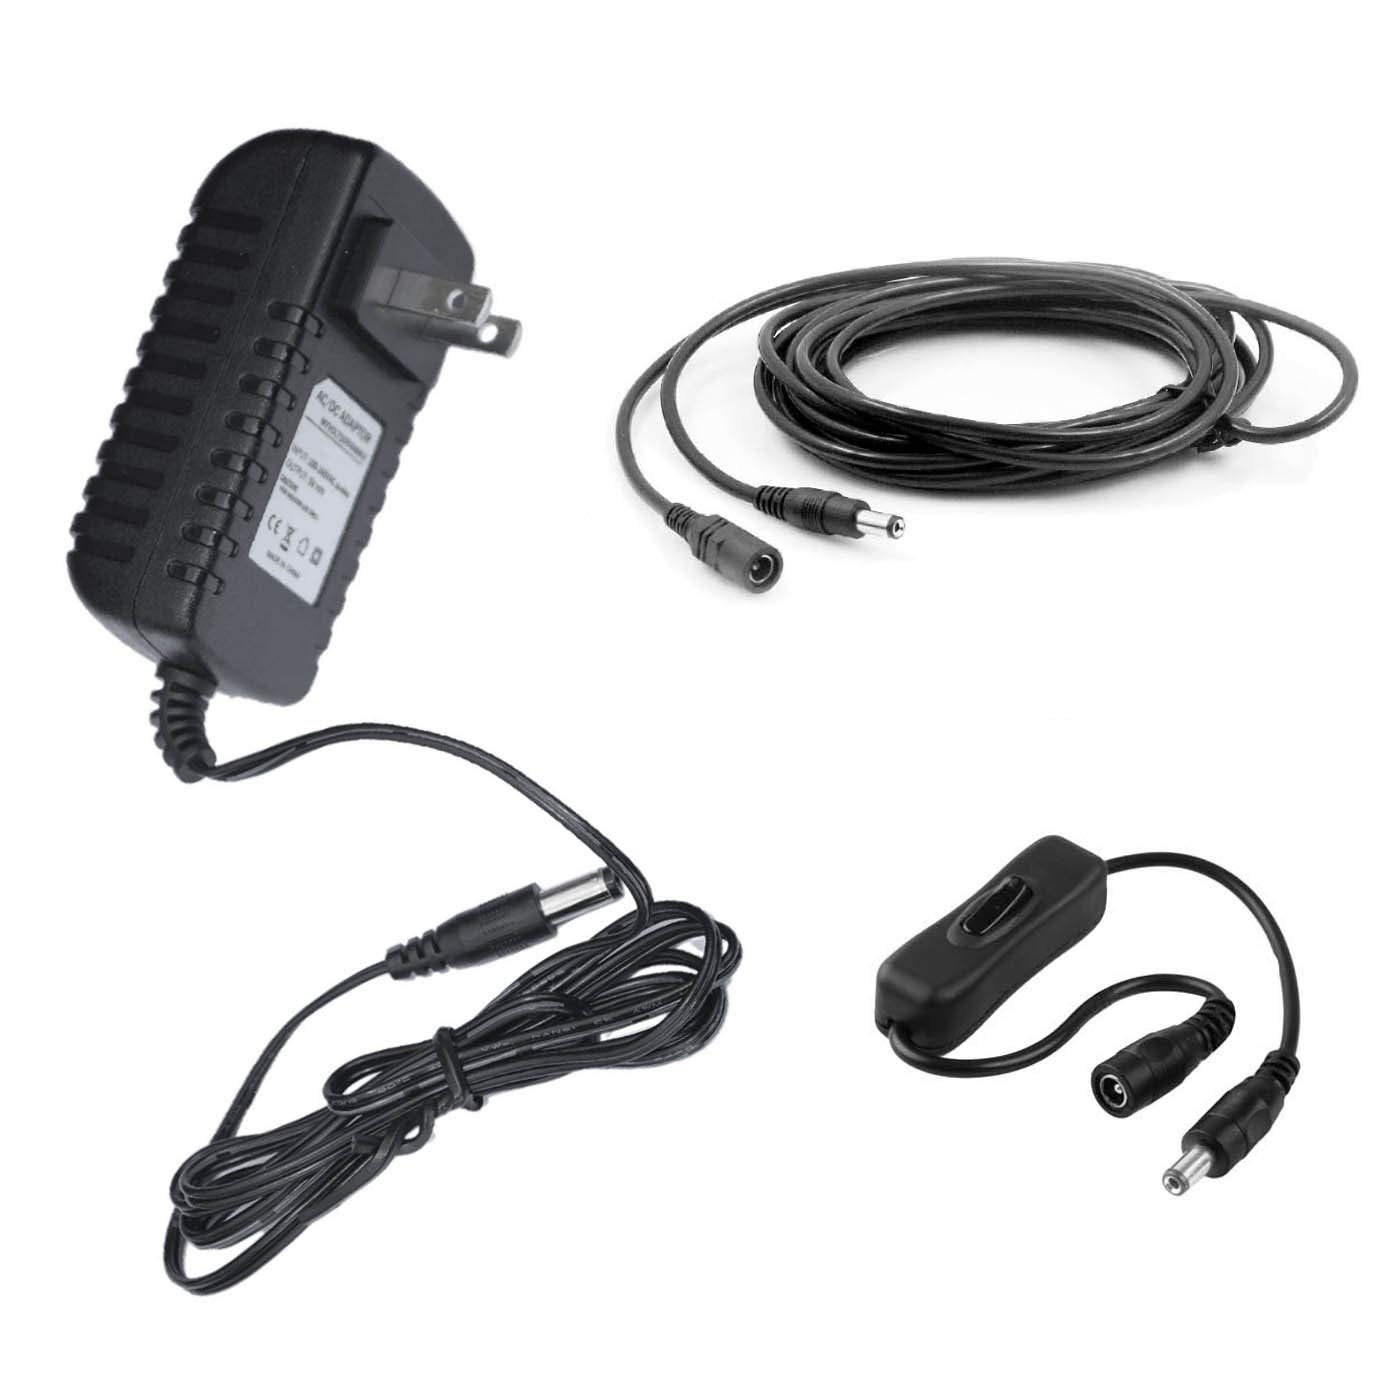 9 V Roland AX - 1 Keytar用電源電源アダプター – USプラグ Premium Plug + US-22032 Premium Plug +  B06XH5TCY5